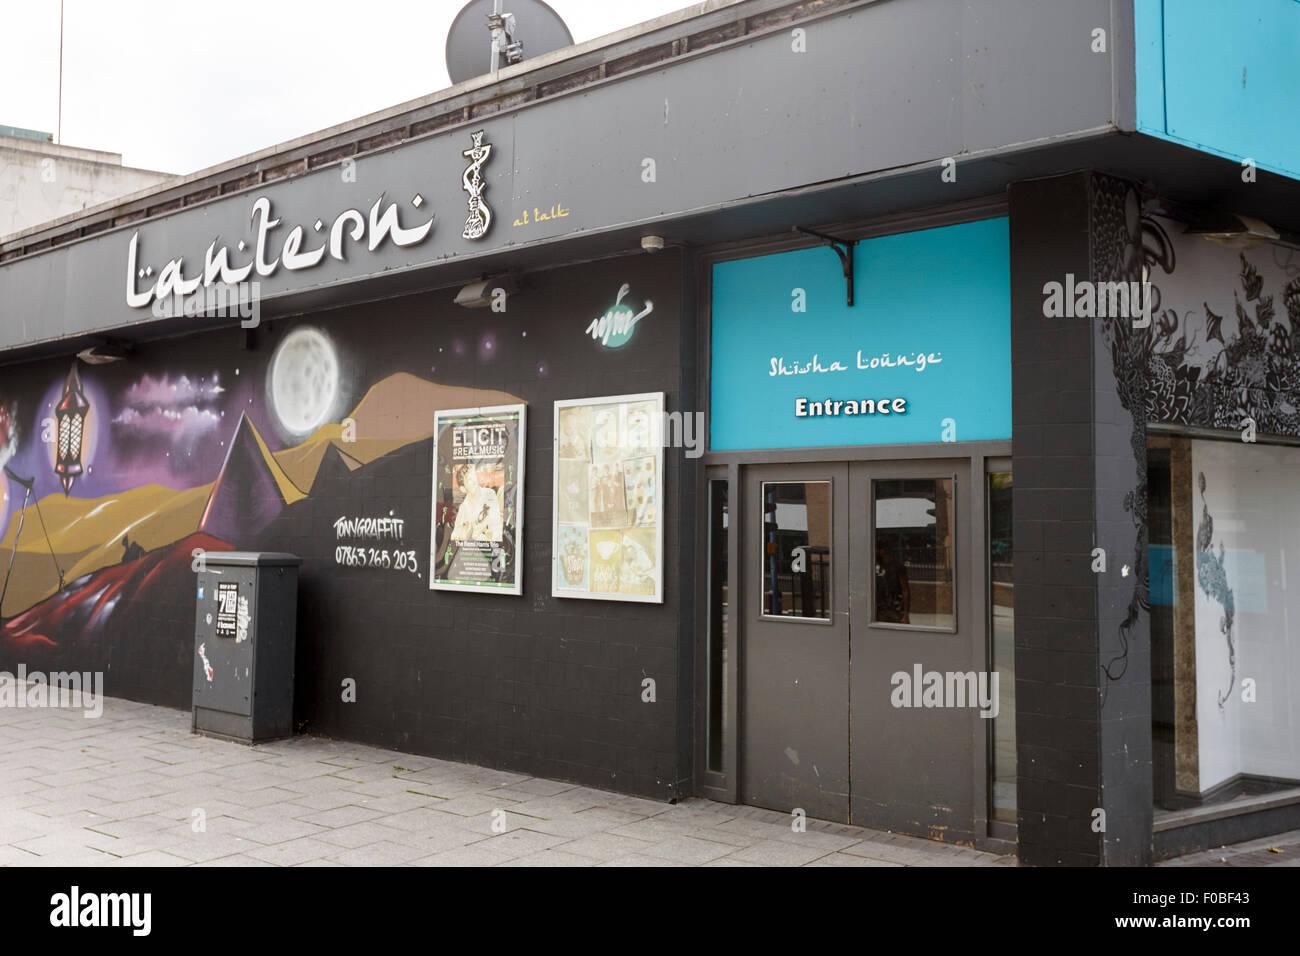 Lantern lounge cafe bar Birmingham UK Photo Stock